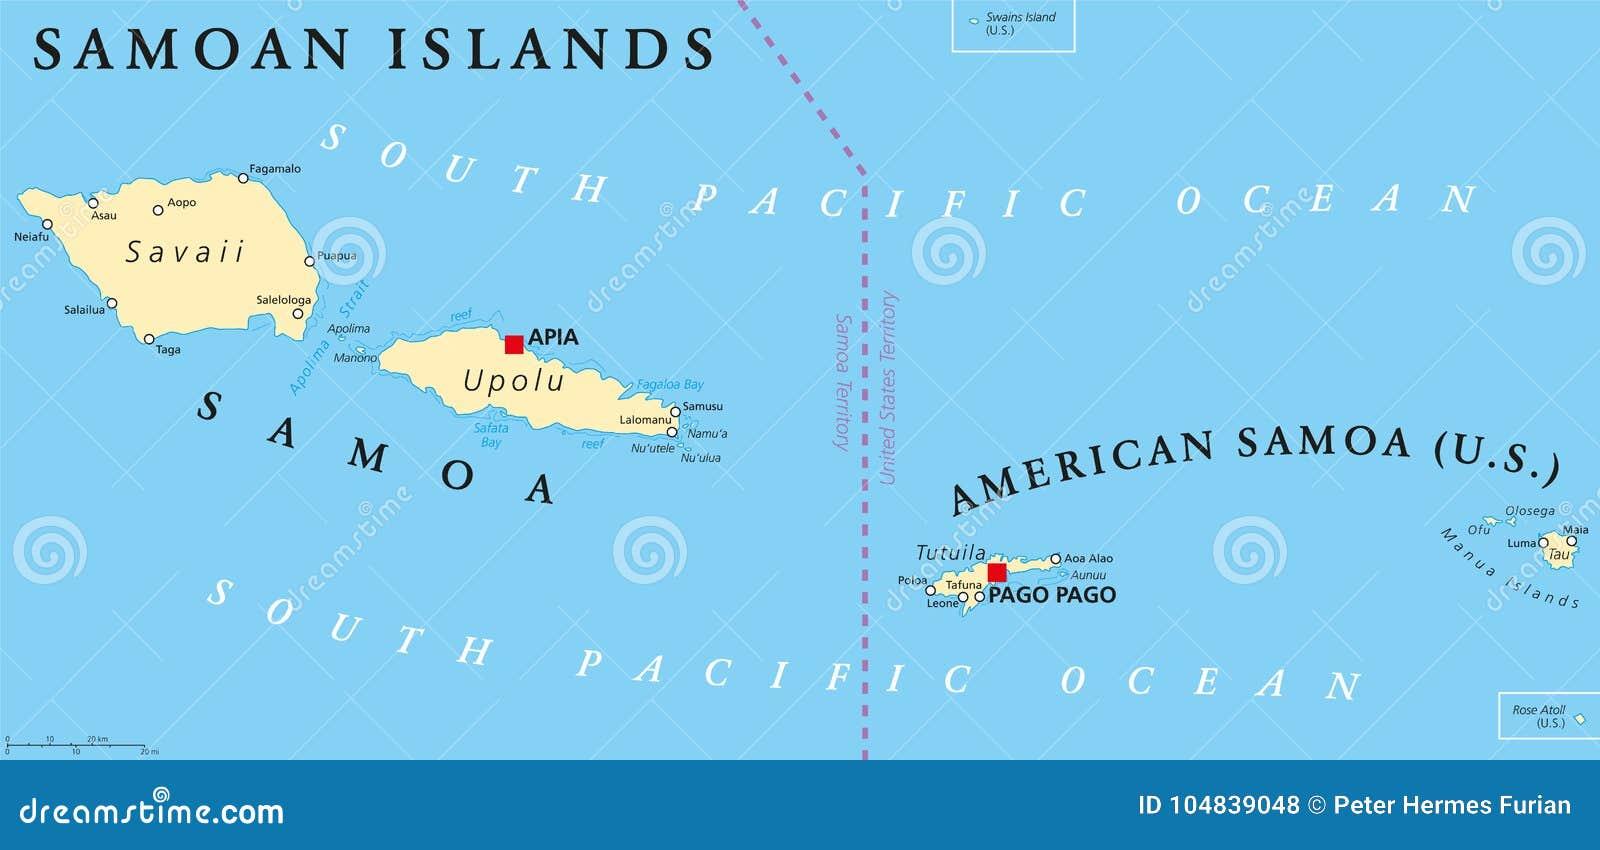 Samoan Islands Political Map Stock Vector - Illustration of ...